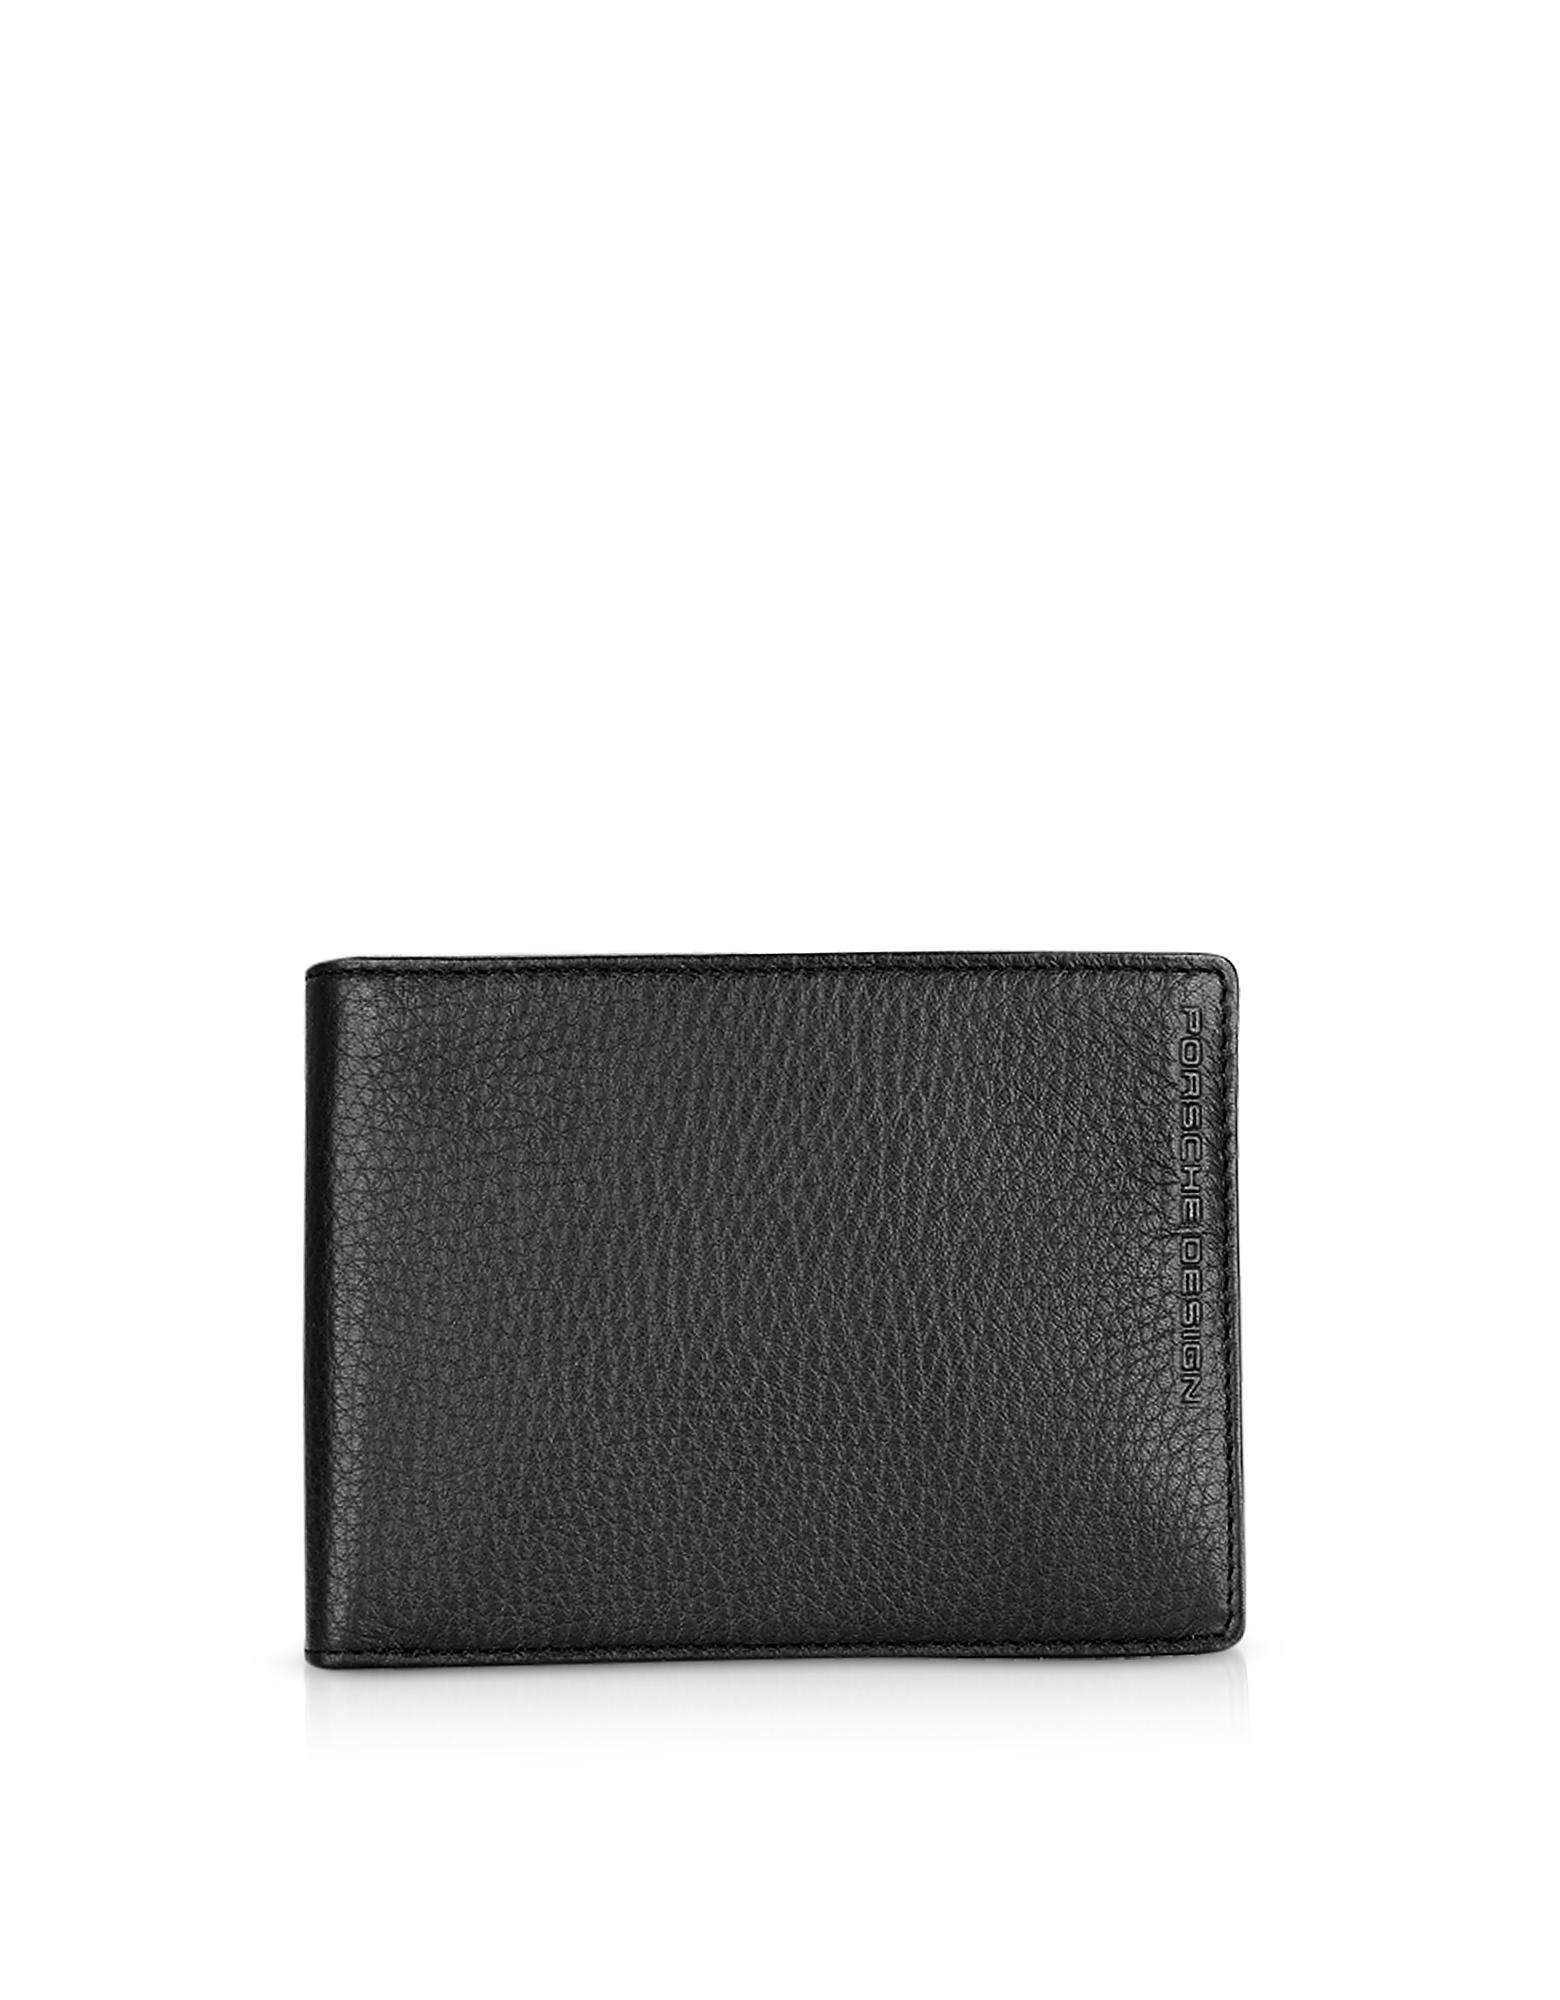 Porsche Design Designer Wallets, Cervo 2.0 H7 Men's BillFold Wallet